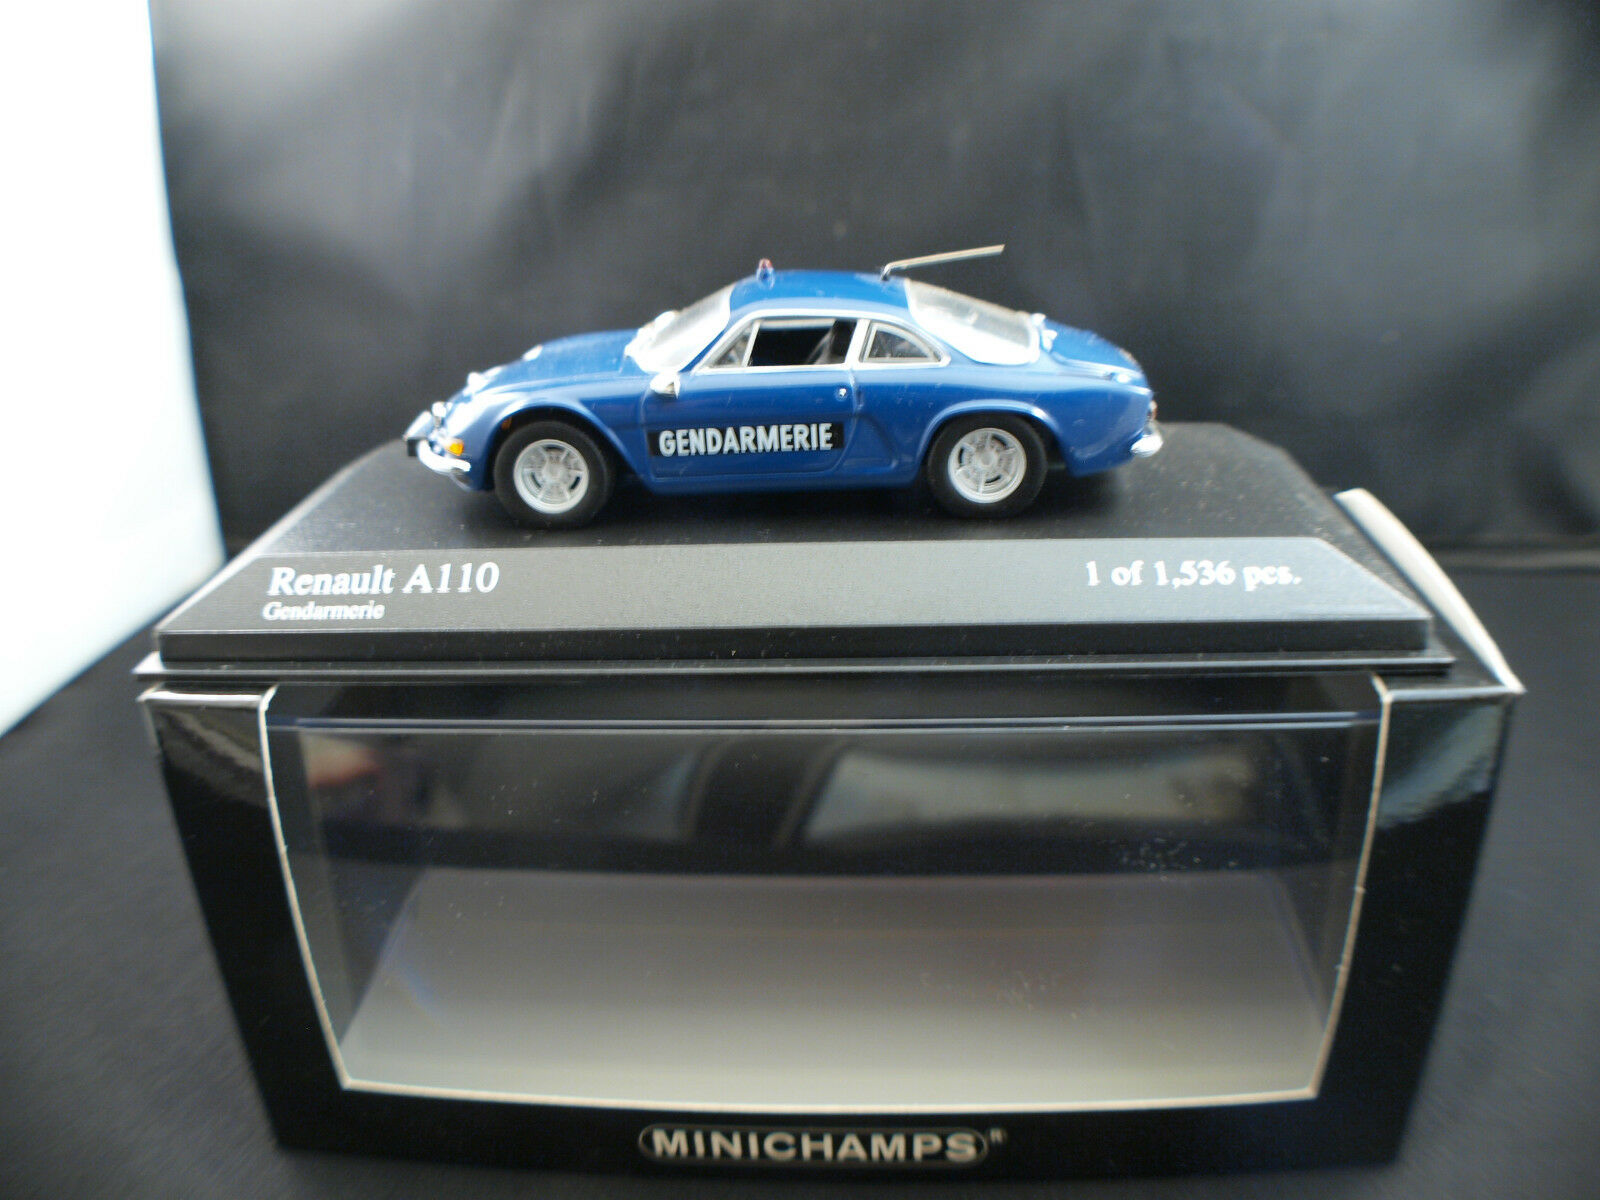 Minichamps n° 430 113690 Renault A110 Gendarmerie neuf boite 1/43 edn limitée